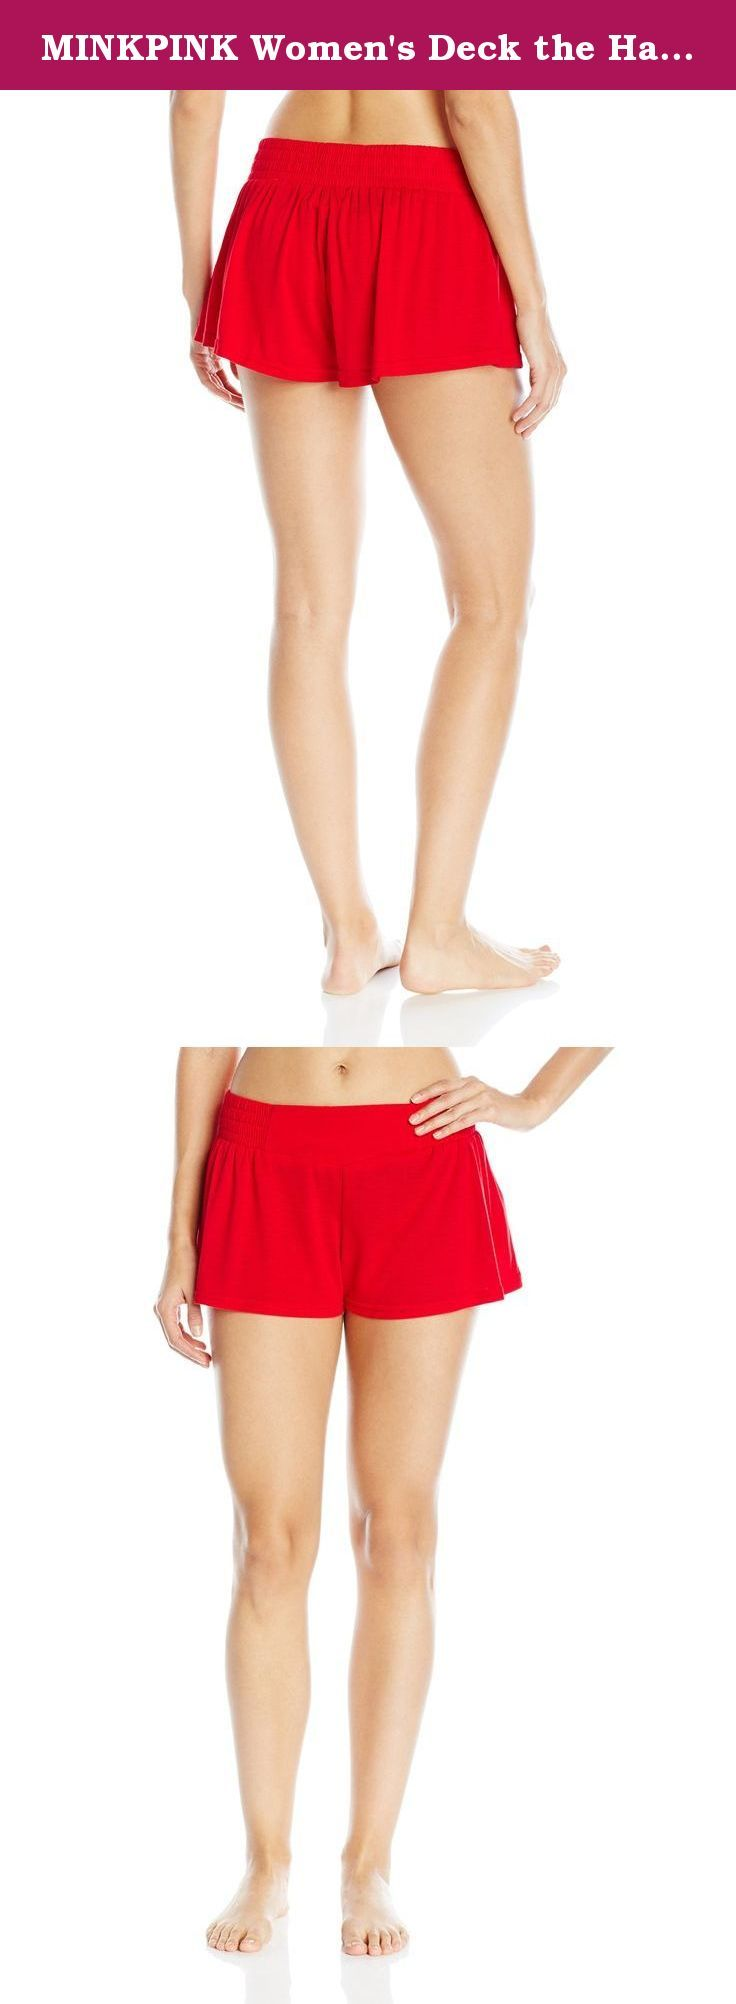 MINKPINK Women's Deck the Halls Shorts, Red, Medium. The deck the halls shorts solid red shorts with elastic waist band.